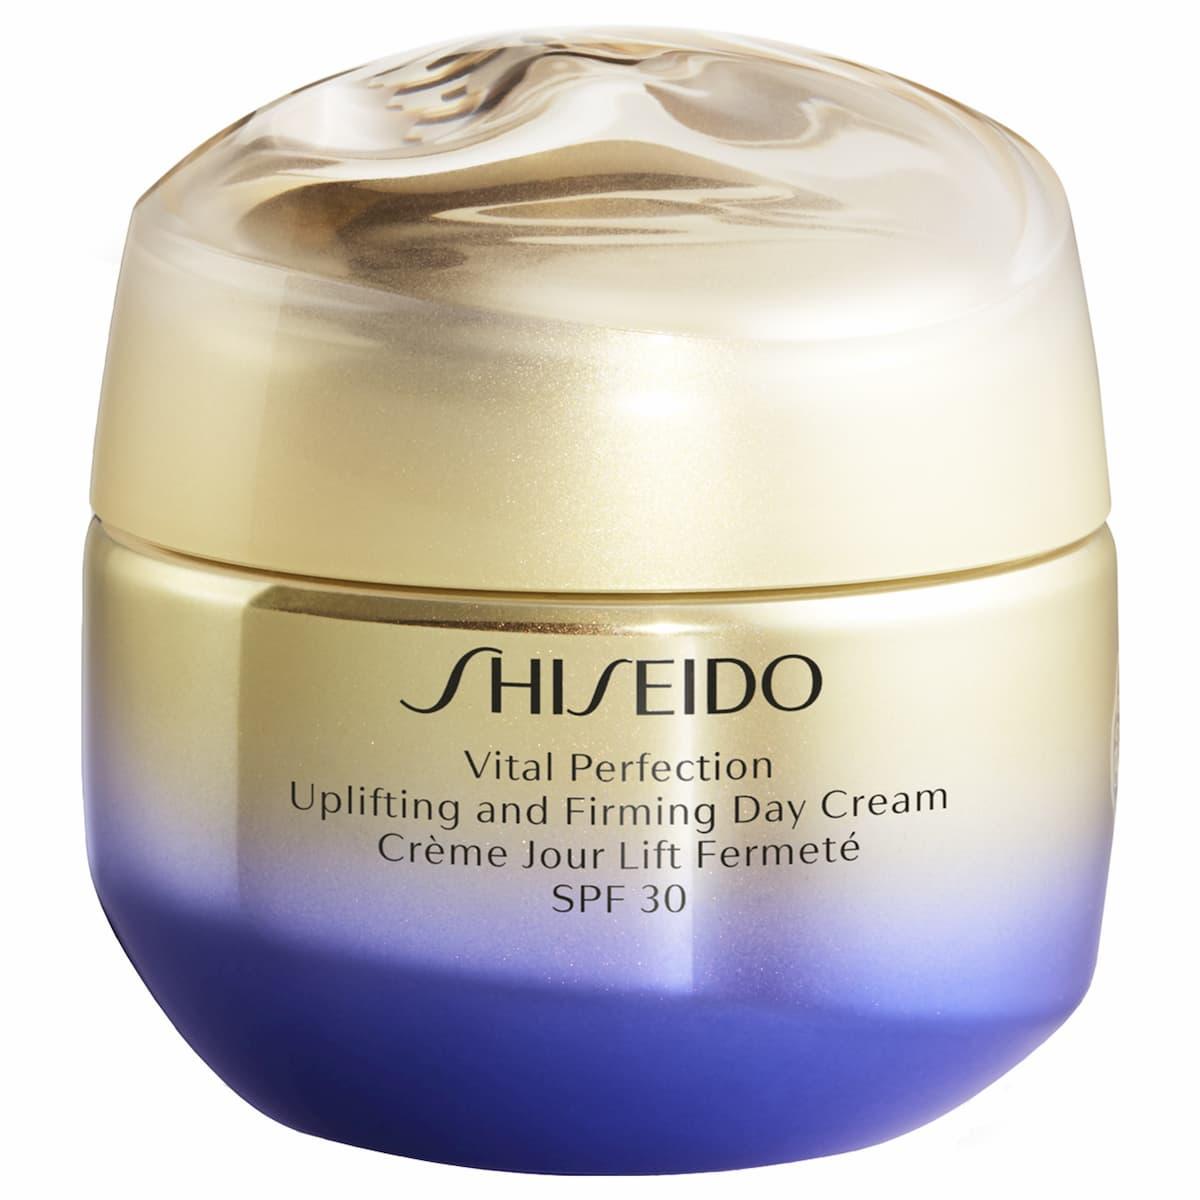 Shiseido - Vital Perfection - Crème Jour Lift Fermeté SPF30 50 ml